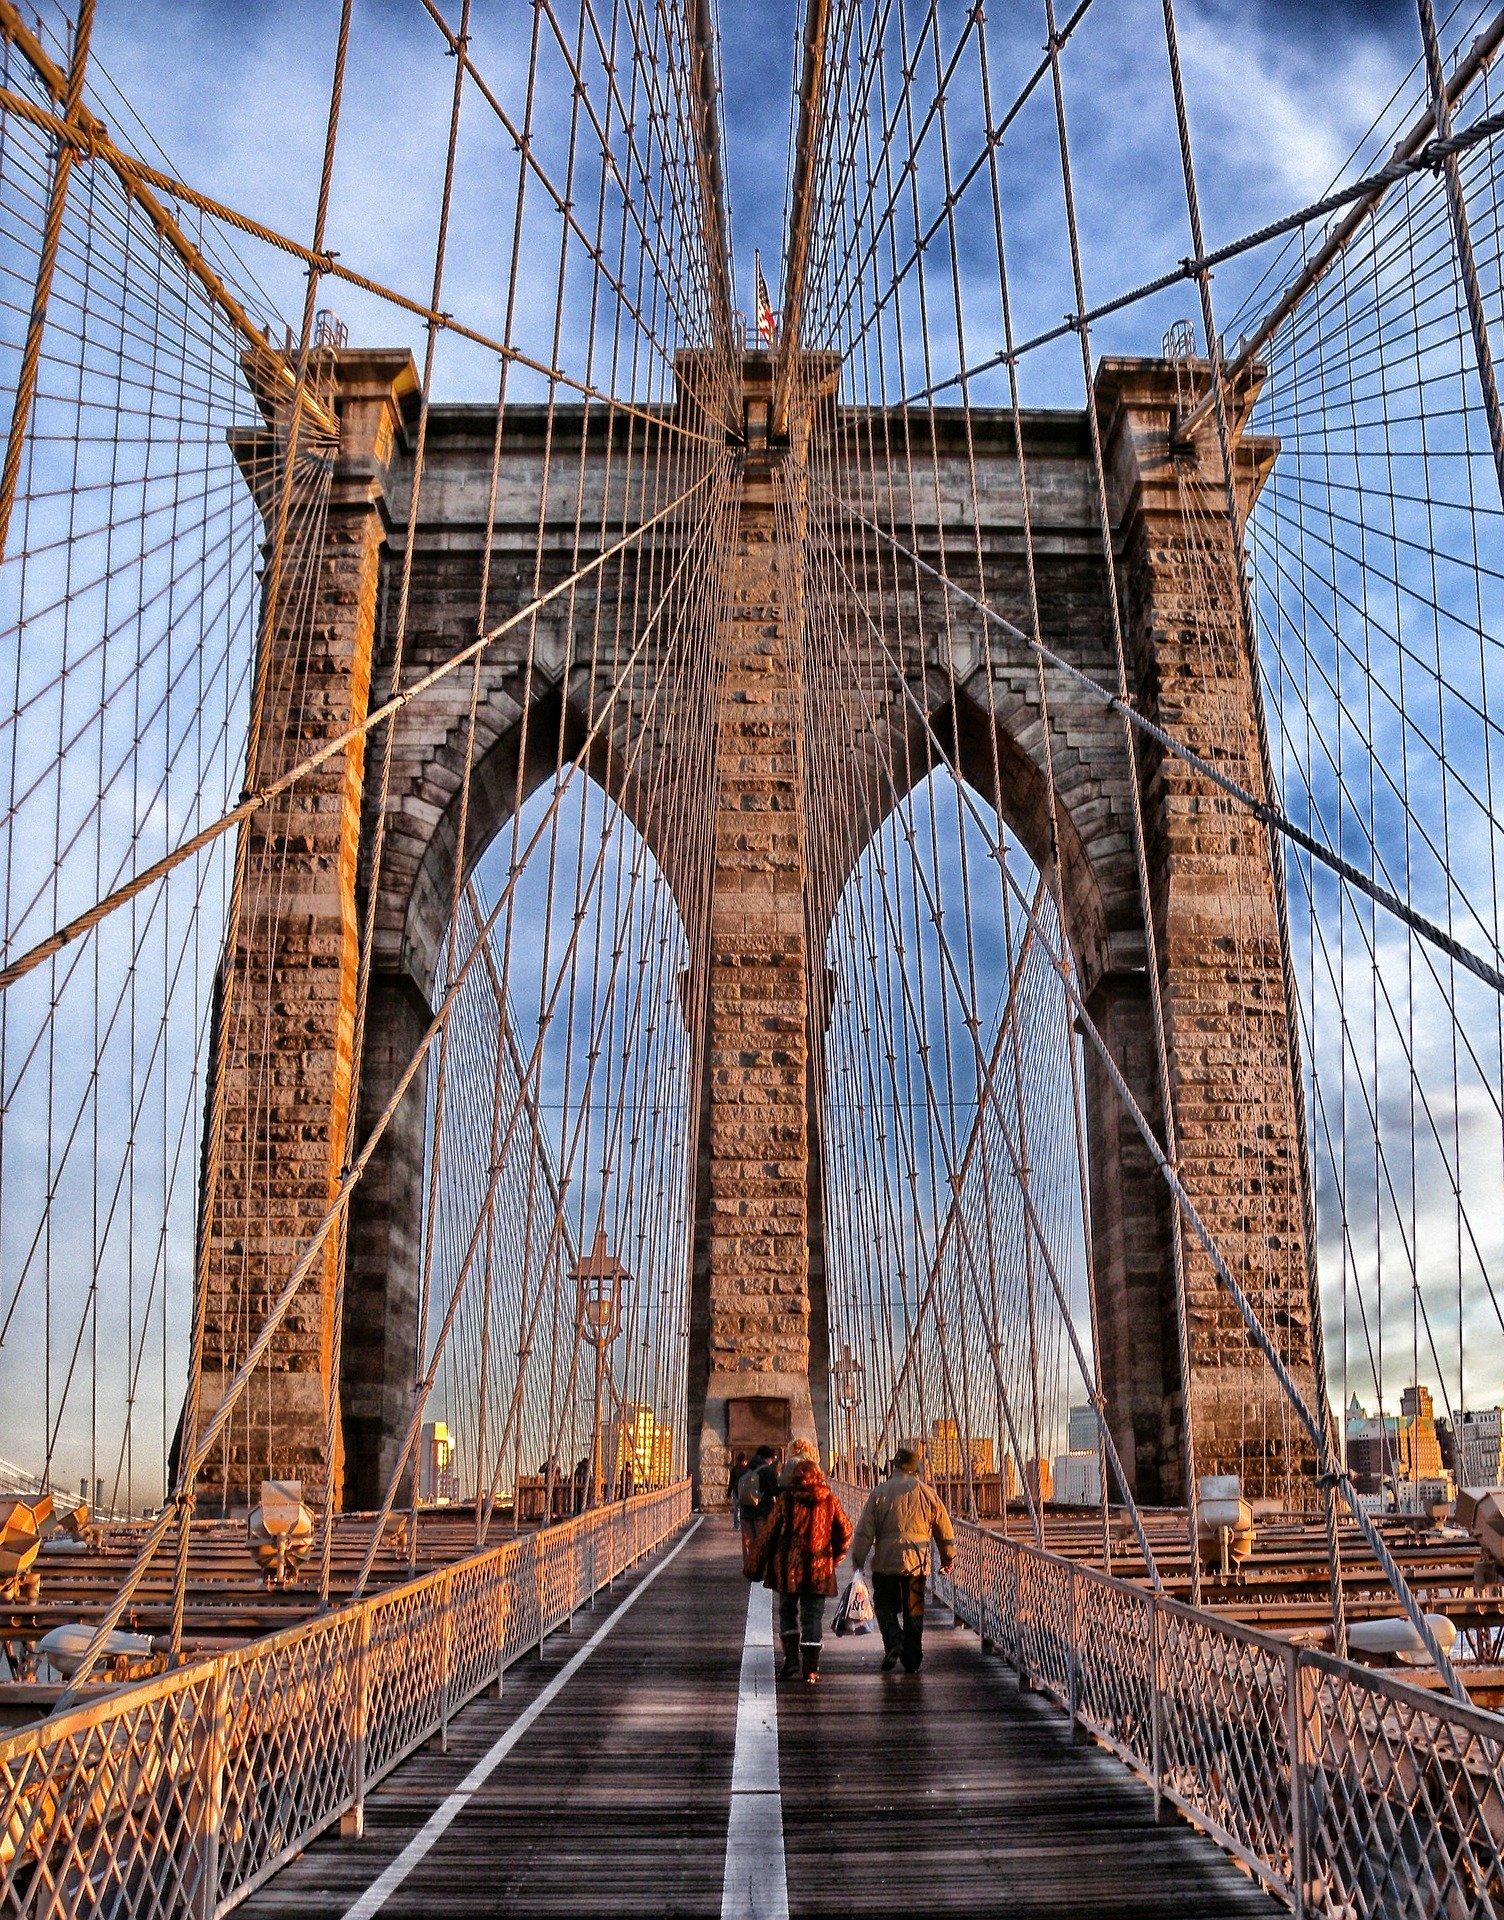 Brooklyn bridge, suspension bridge, landmark